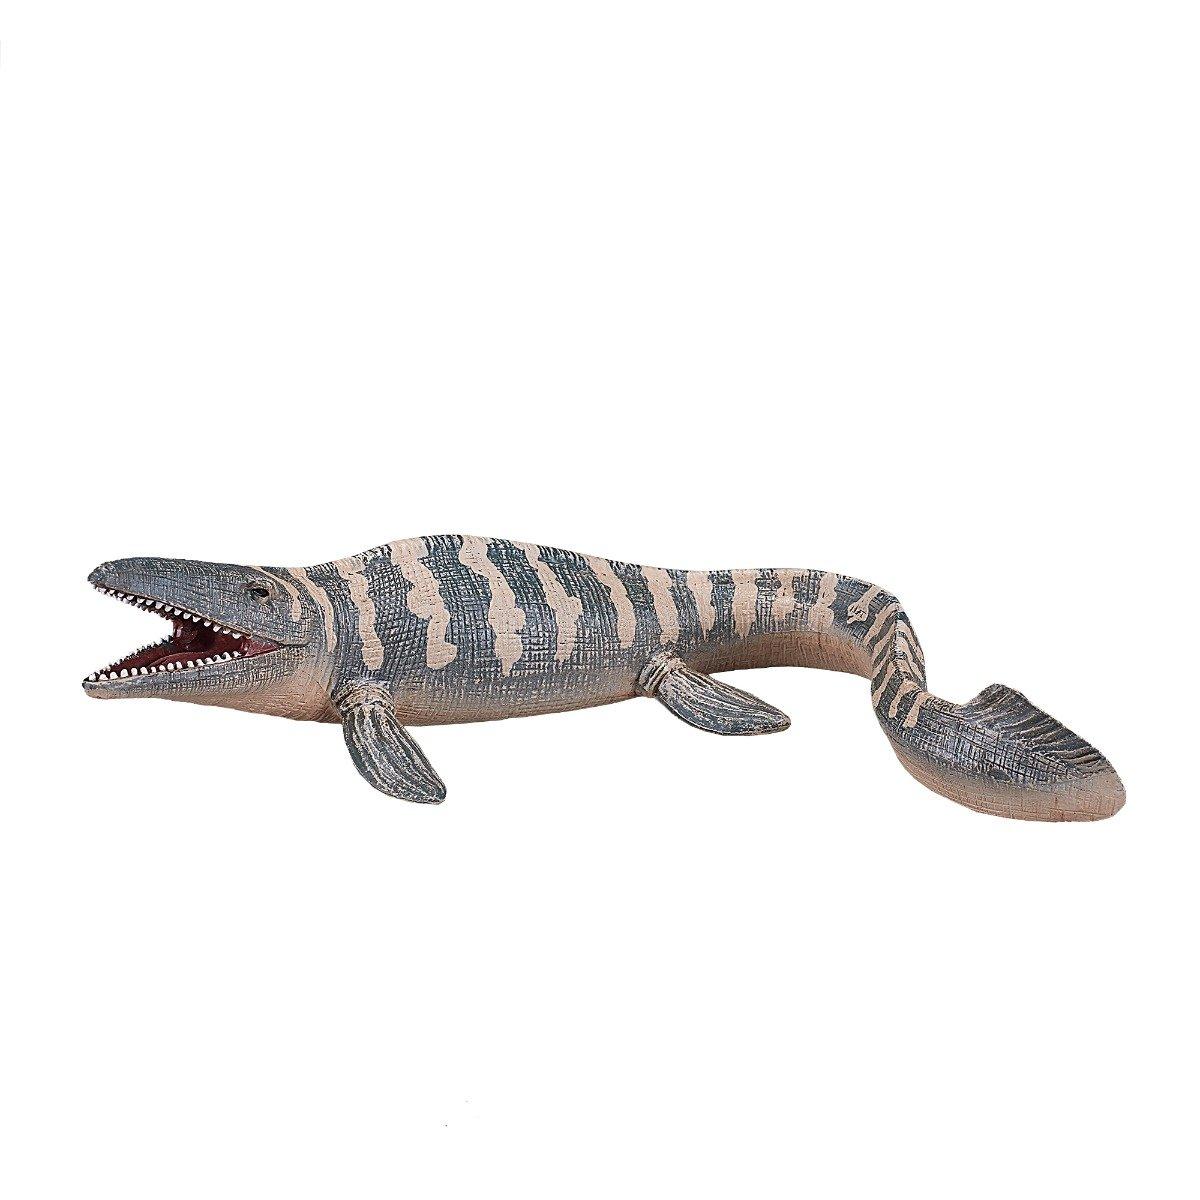 Figurina Mojo, Reptila Tylosaurus